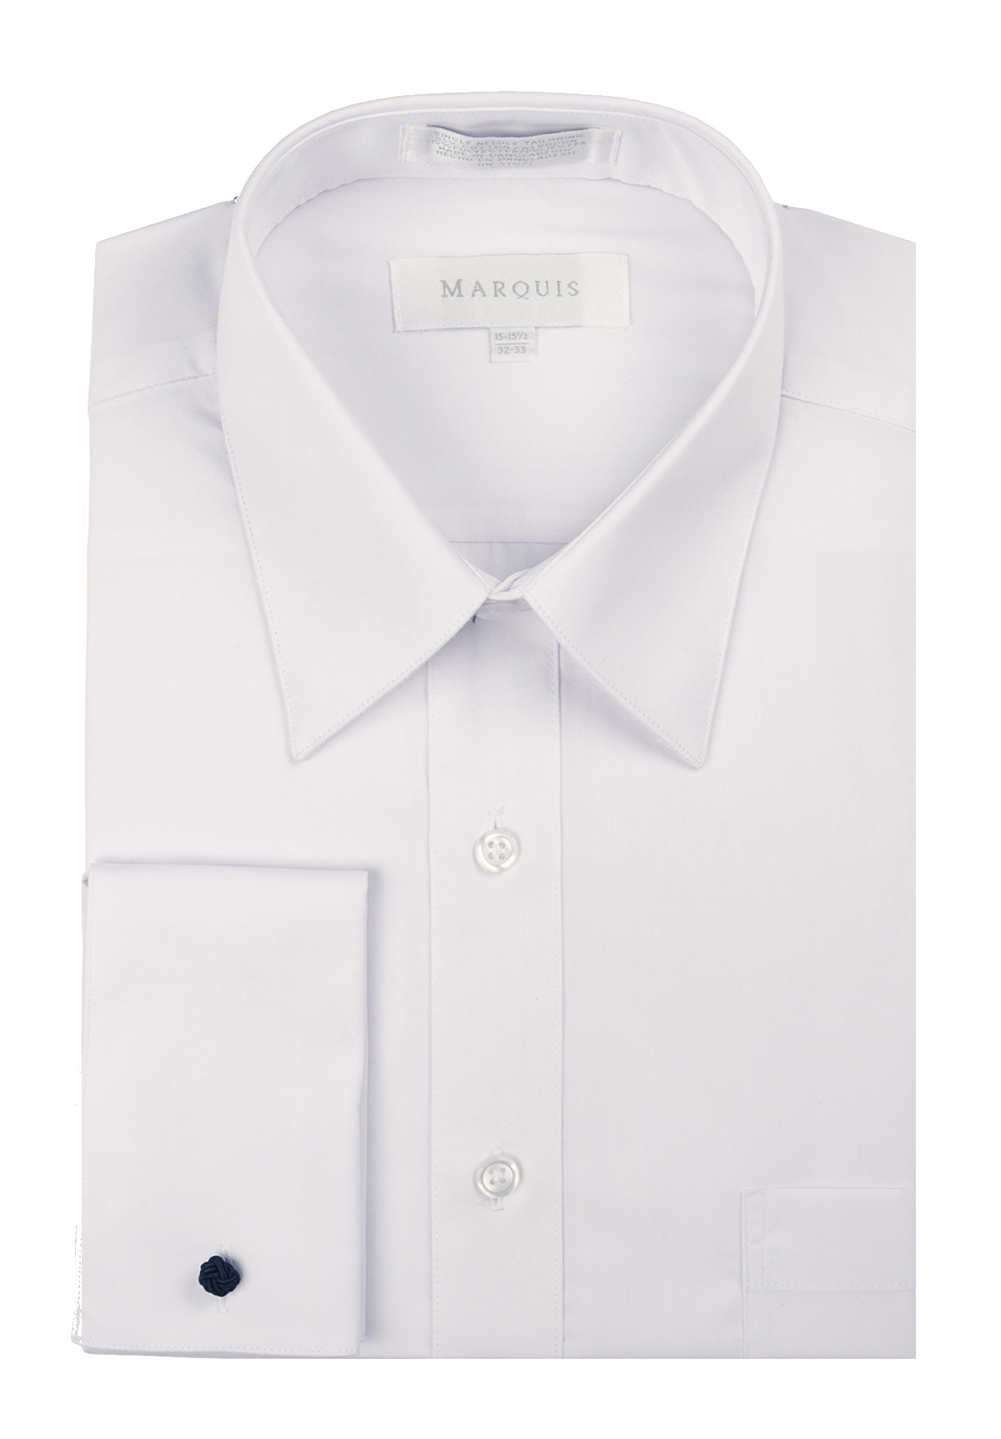 Marquis Mens Dress Shirts Walmart Com